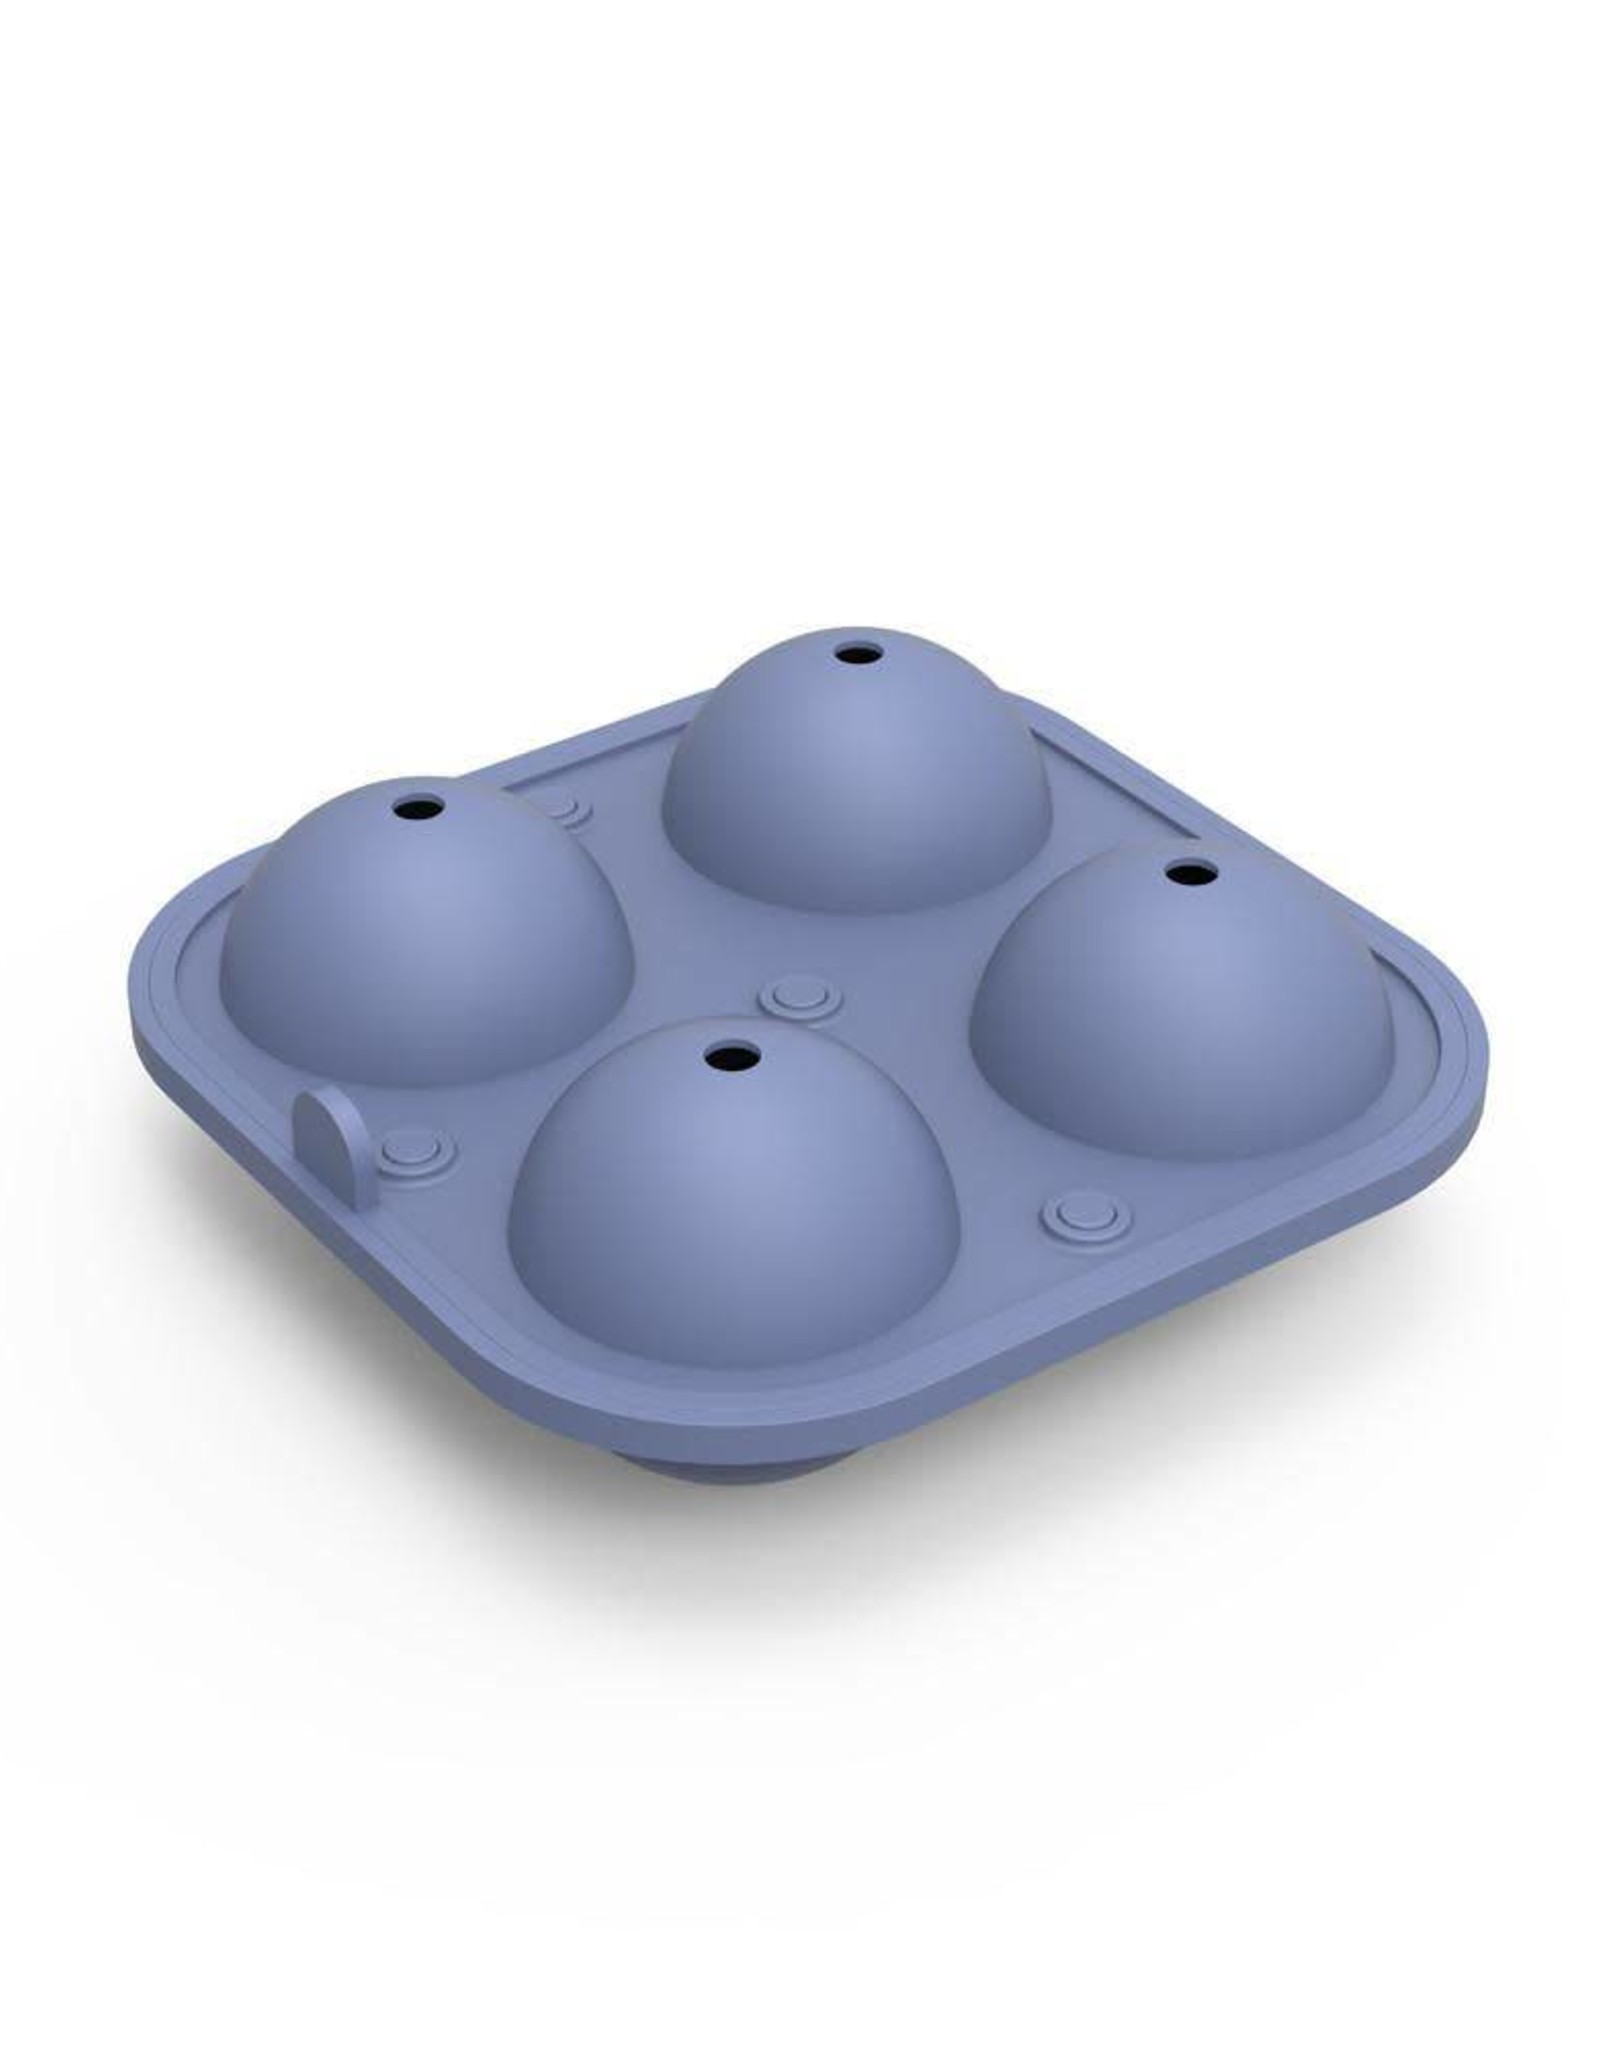 Sphere Ice Mold - Blue